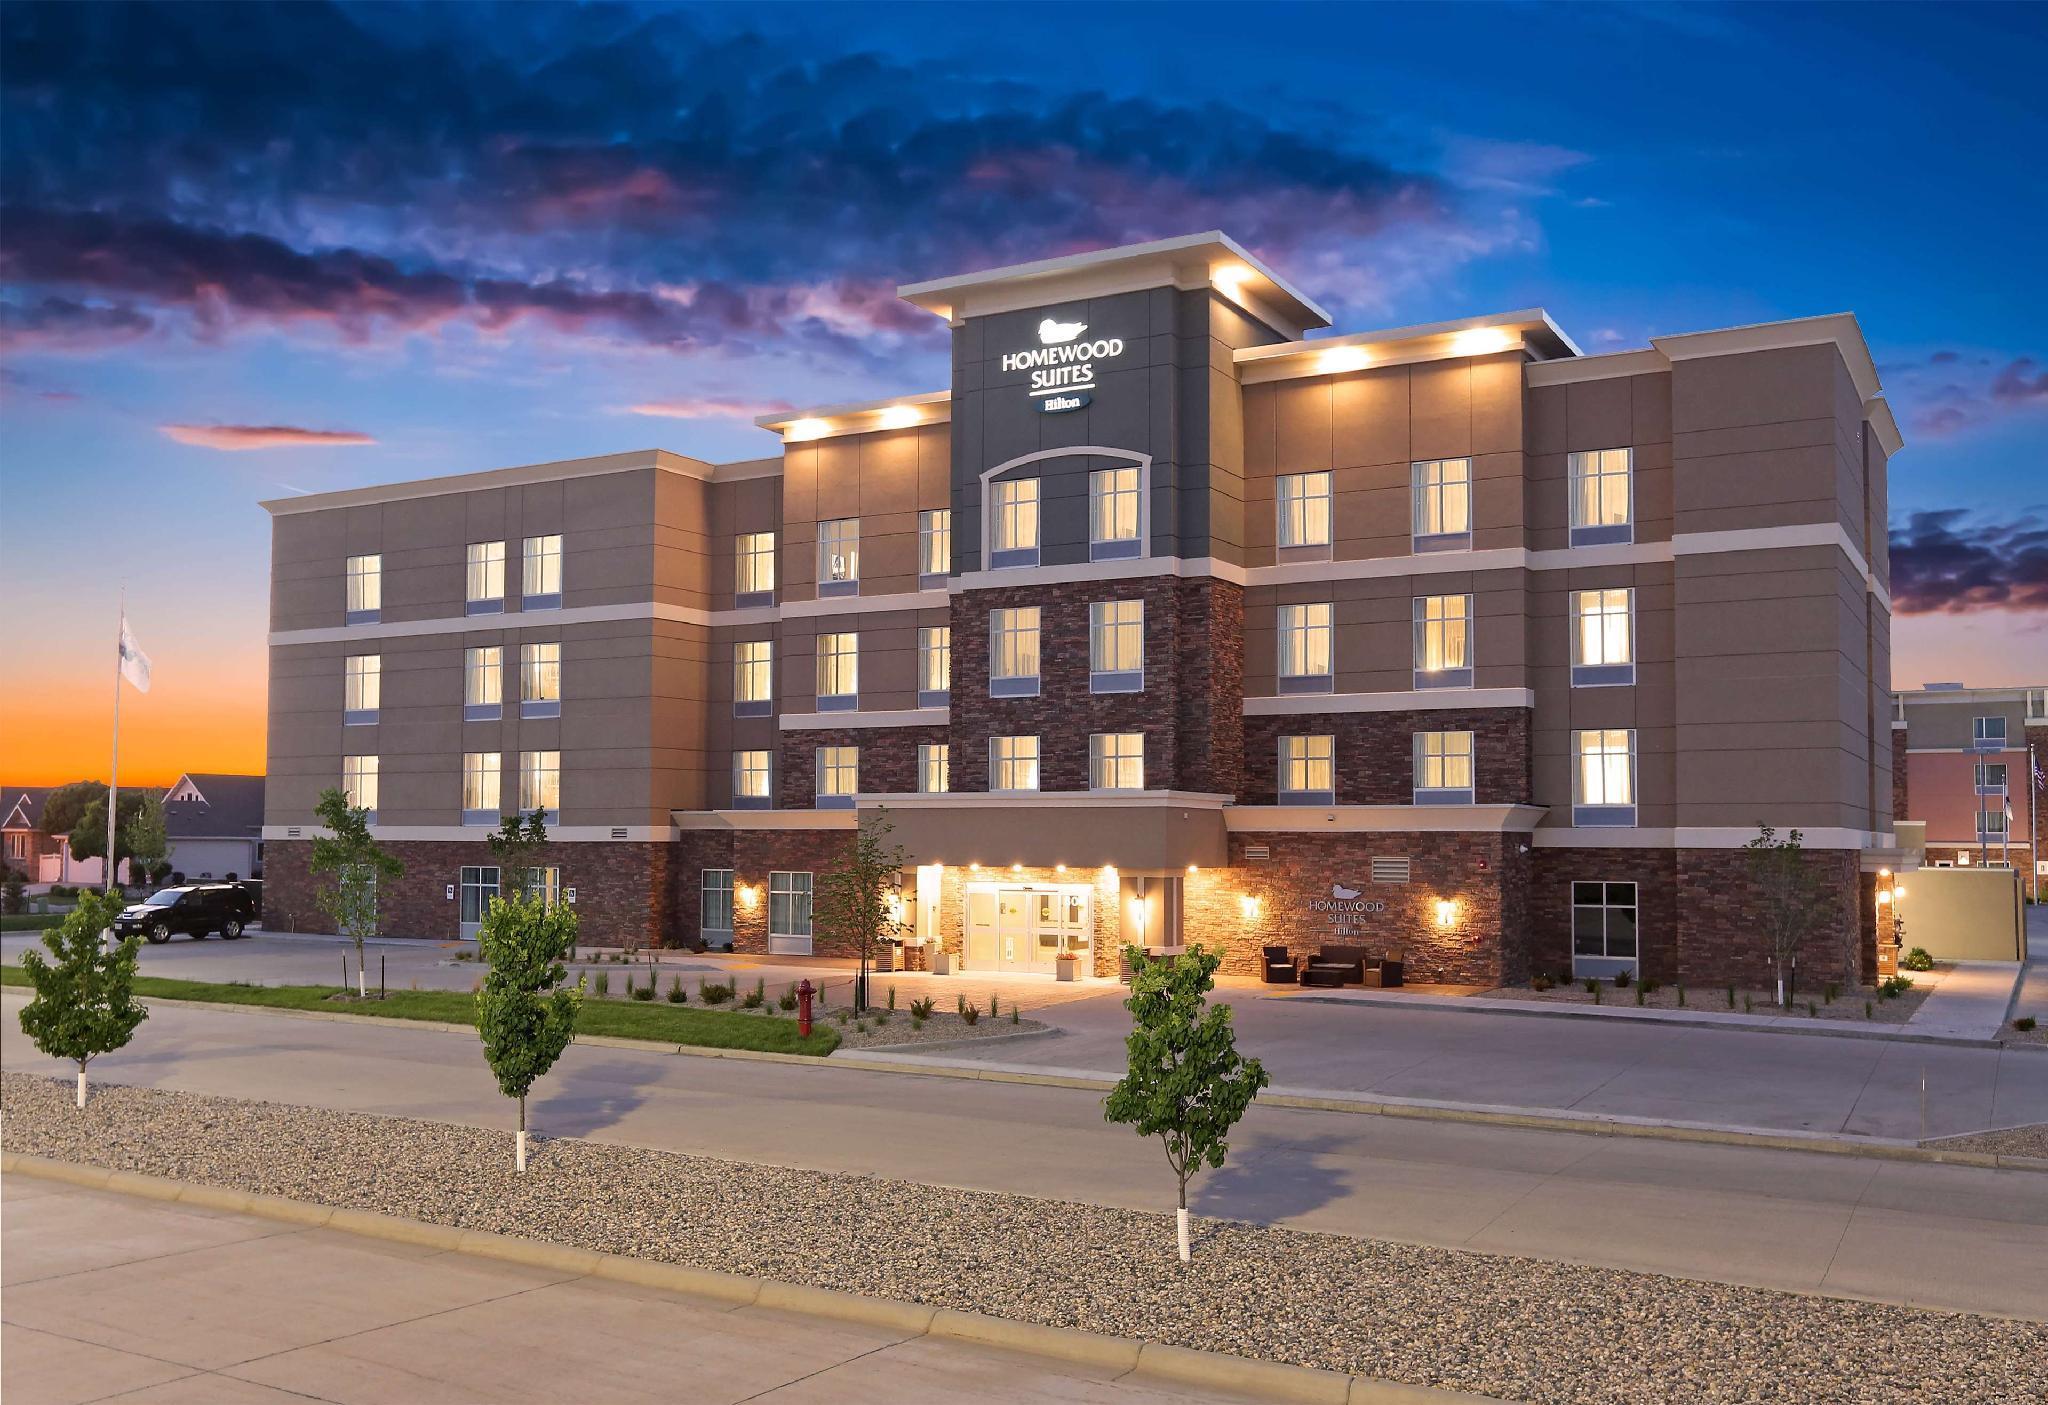 Homewood Suites By Hilton West Fargo Sanford Medical Center